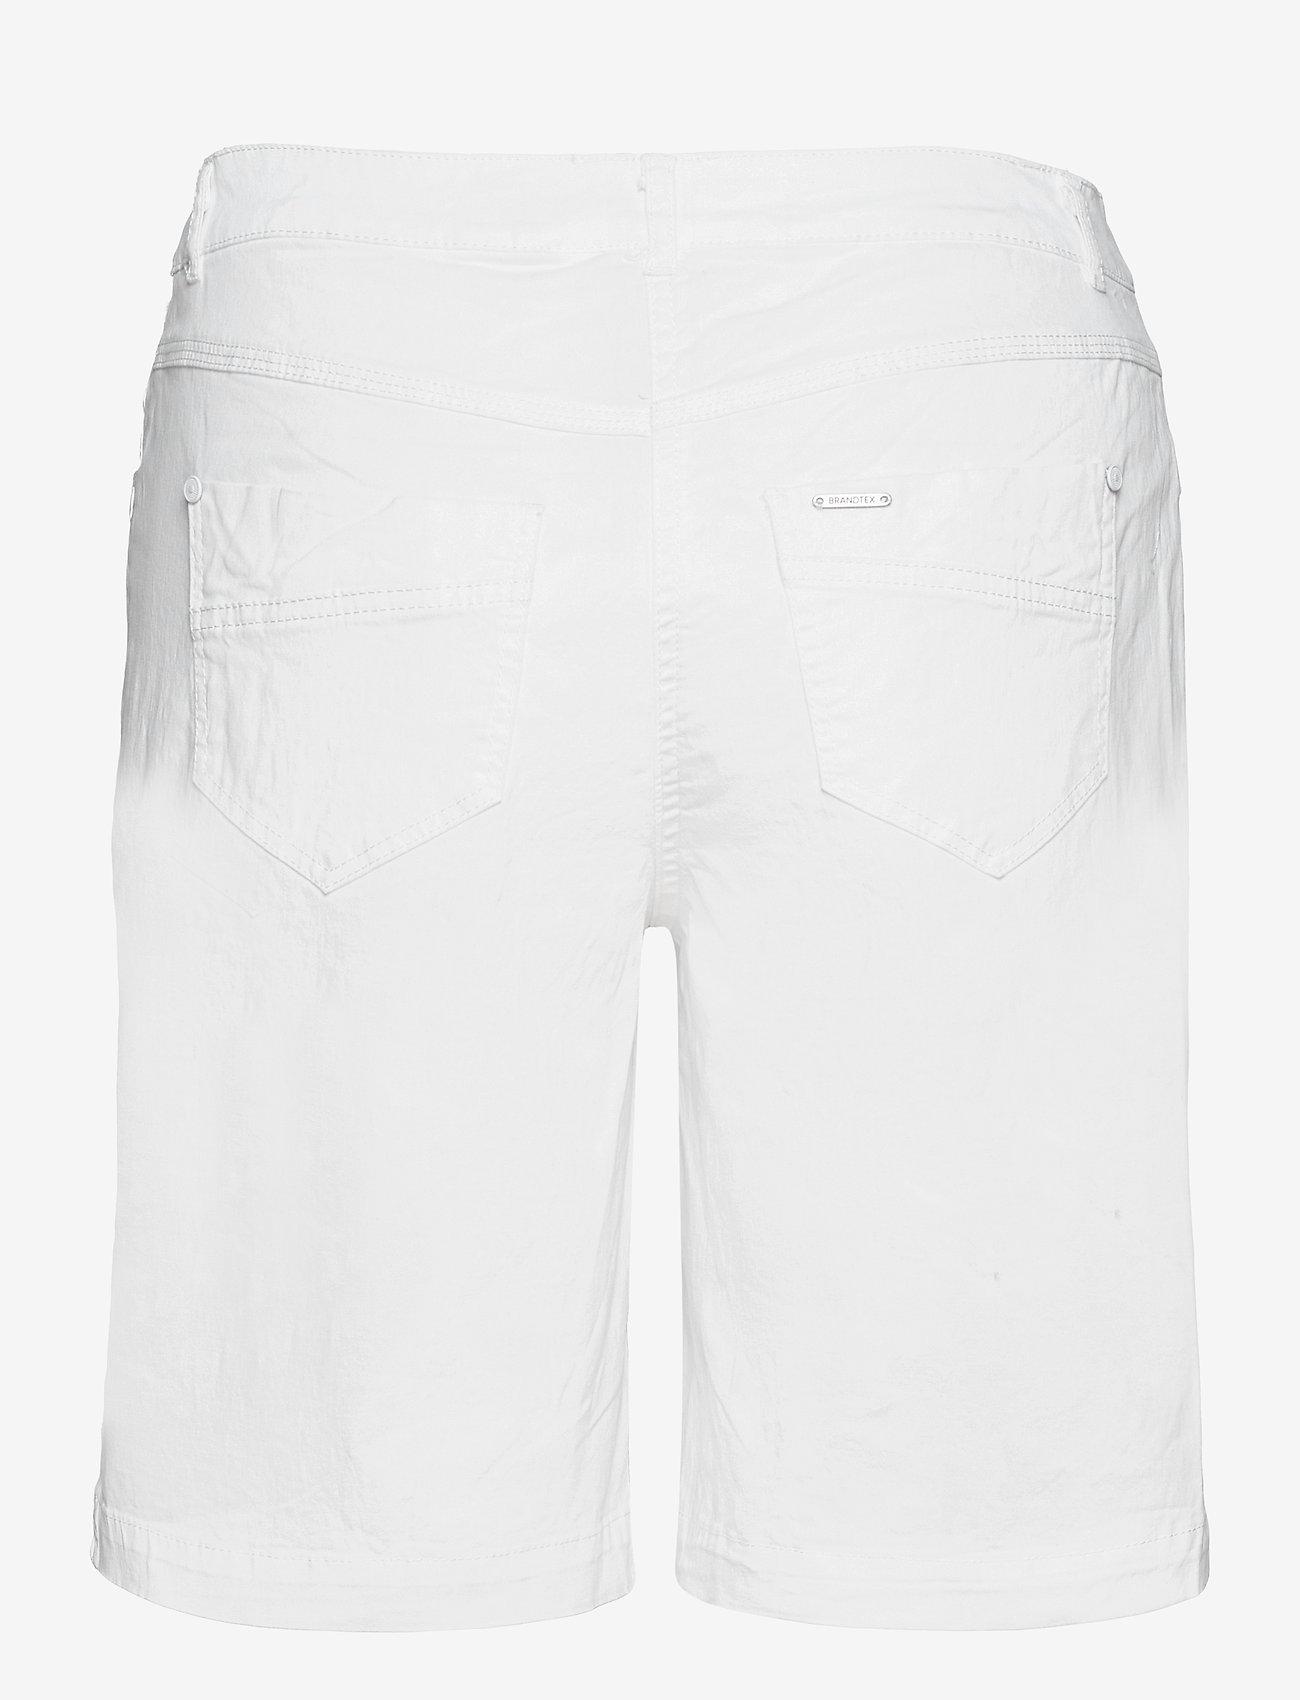 Brandtex - Casual shorts - chino shorts - white - 1